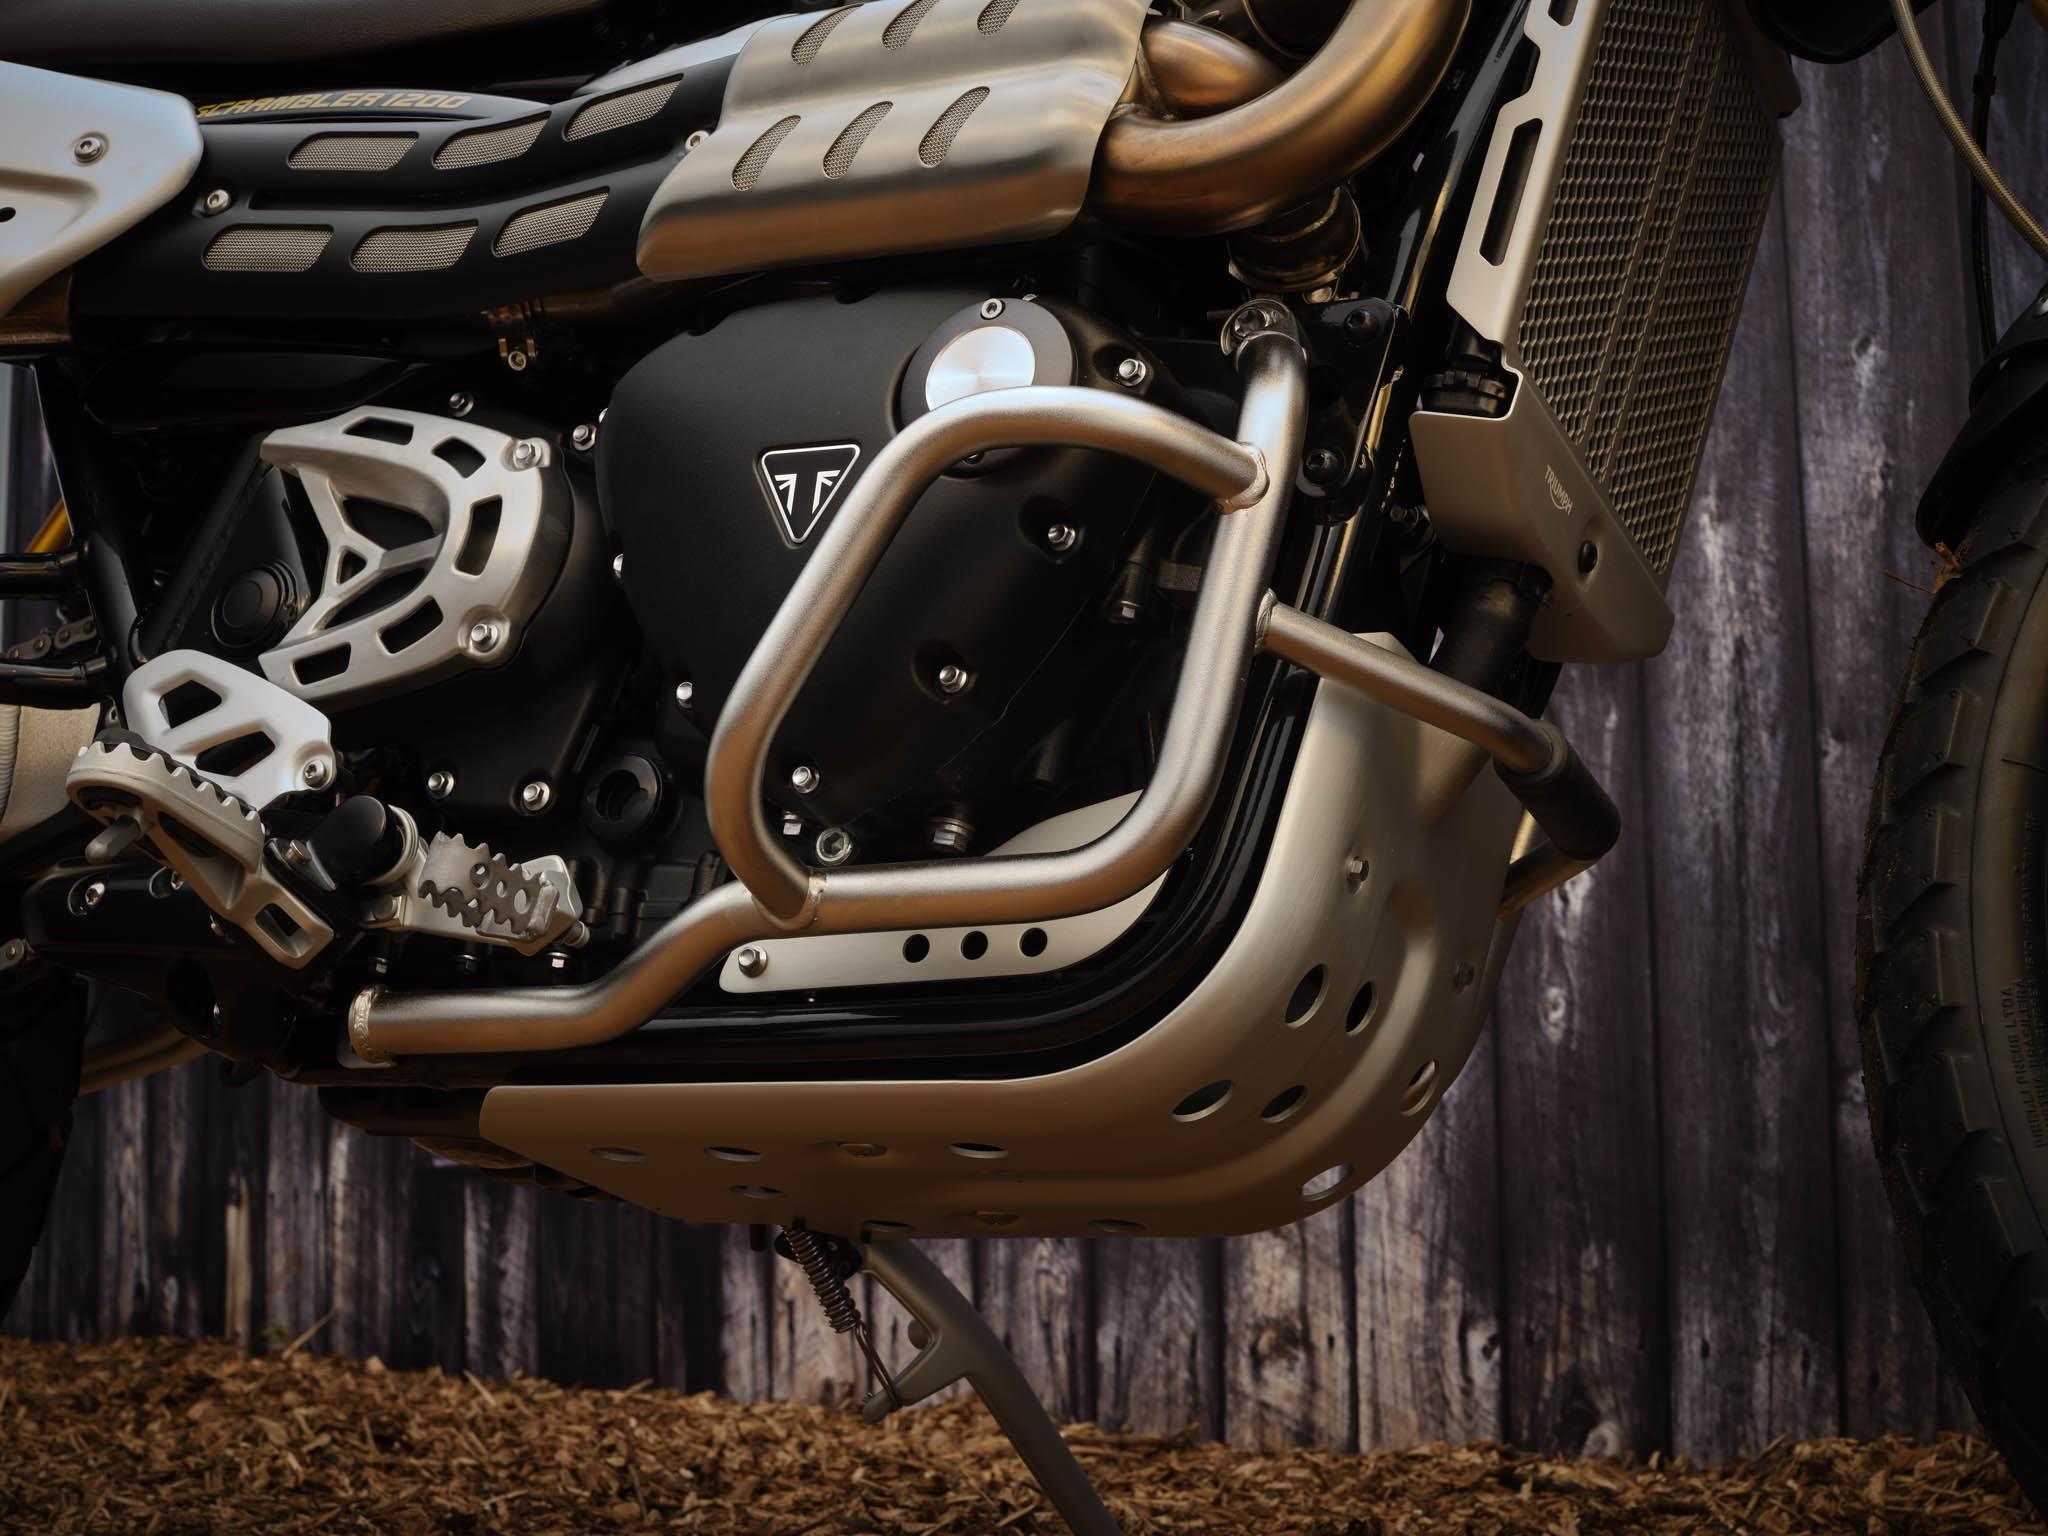 Triumph_Scrambler_1200_Steve_McQueen_Details_2021-6